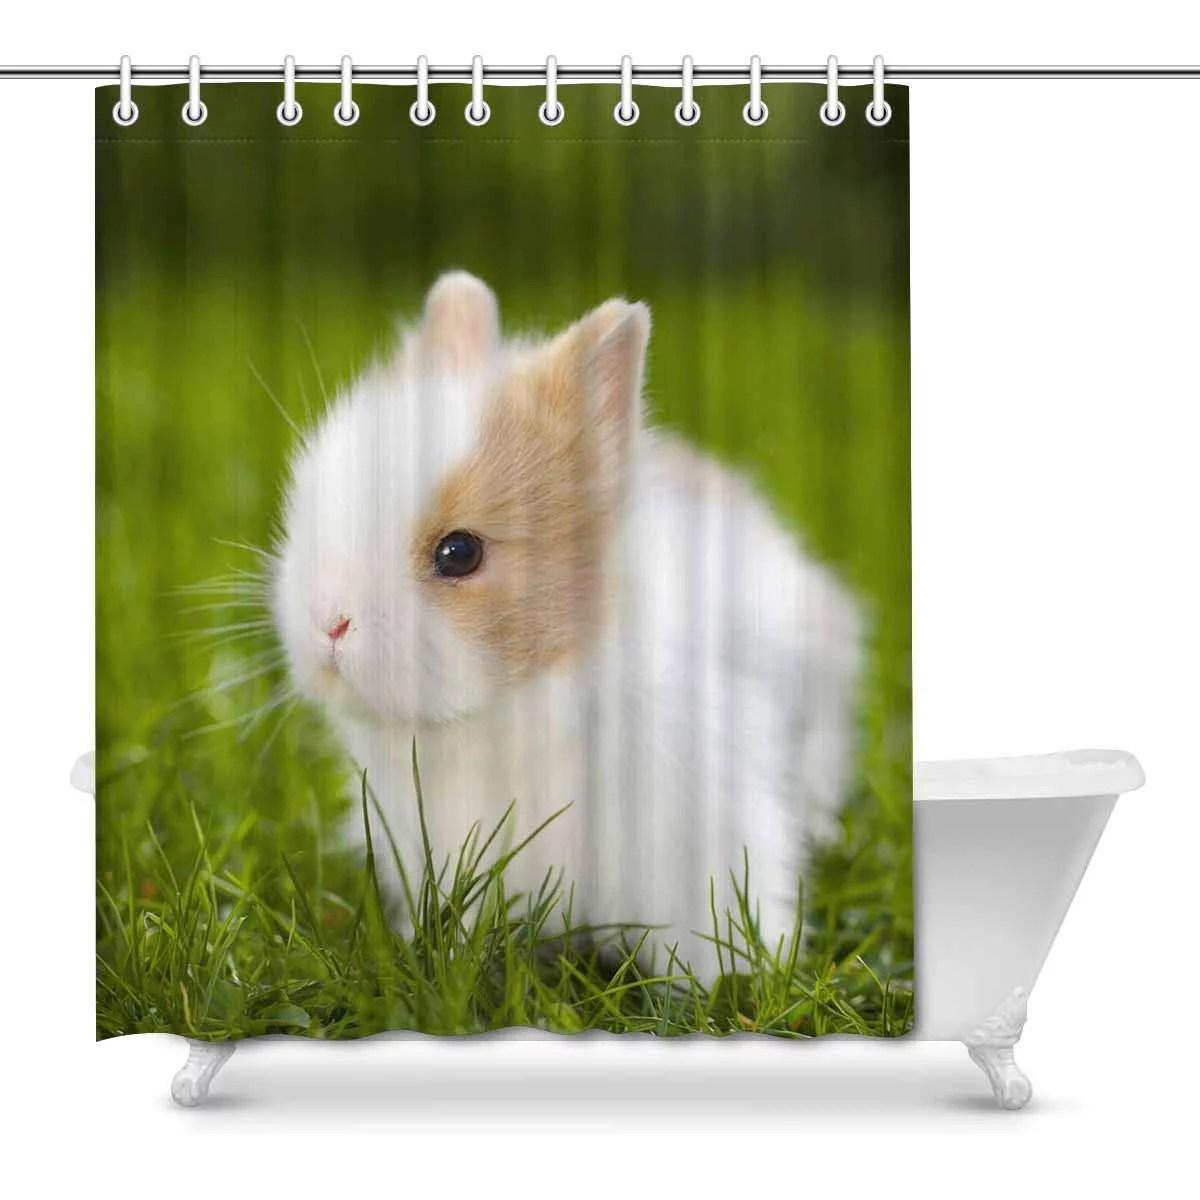 Mkhert Baby Rabbit Sitting In Grassland Cute Animal Home Decor Waterproof Polyester Fabric